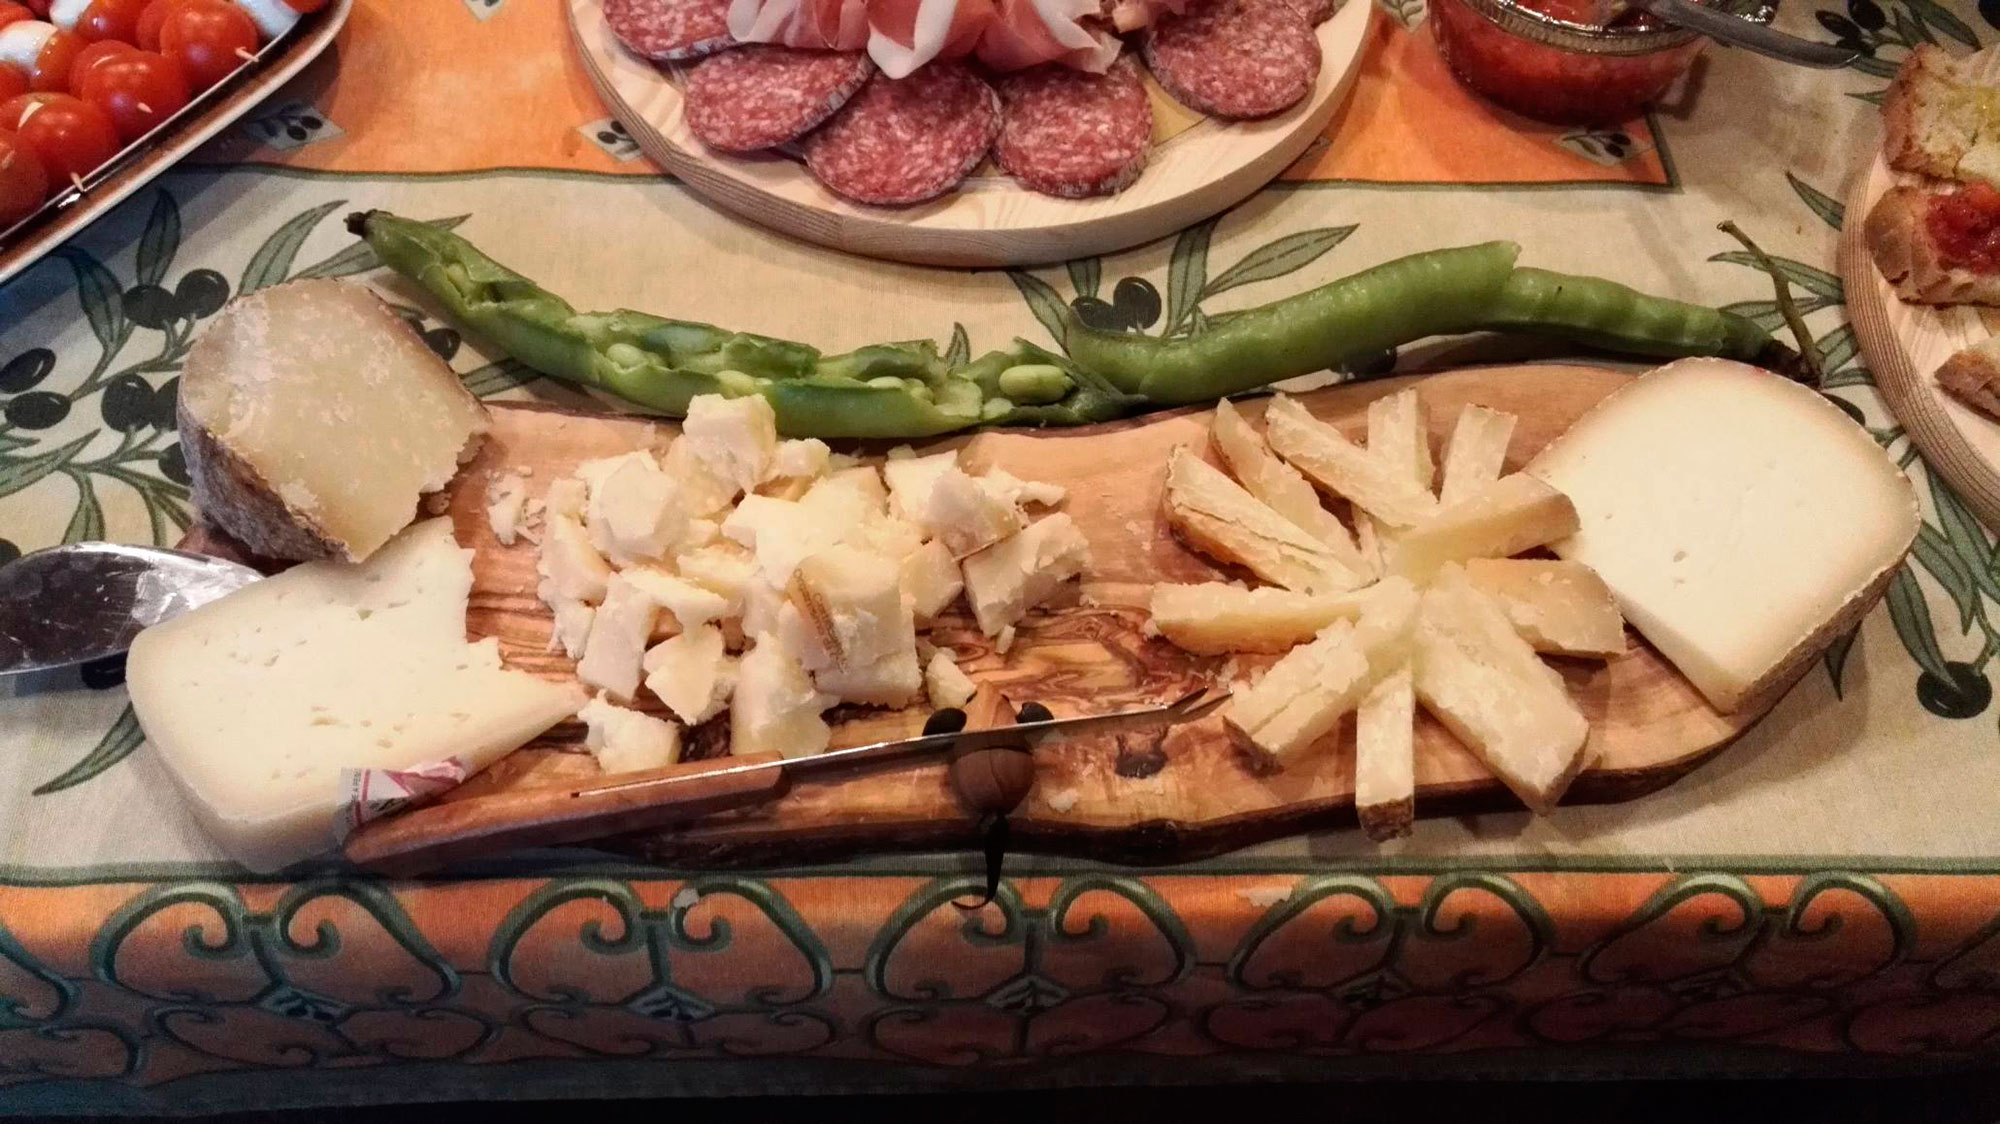 Tuscan chees